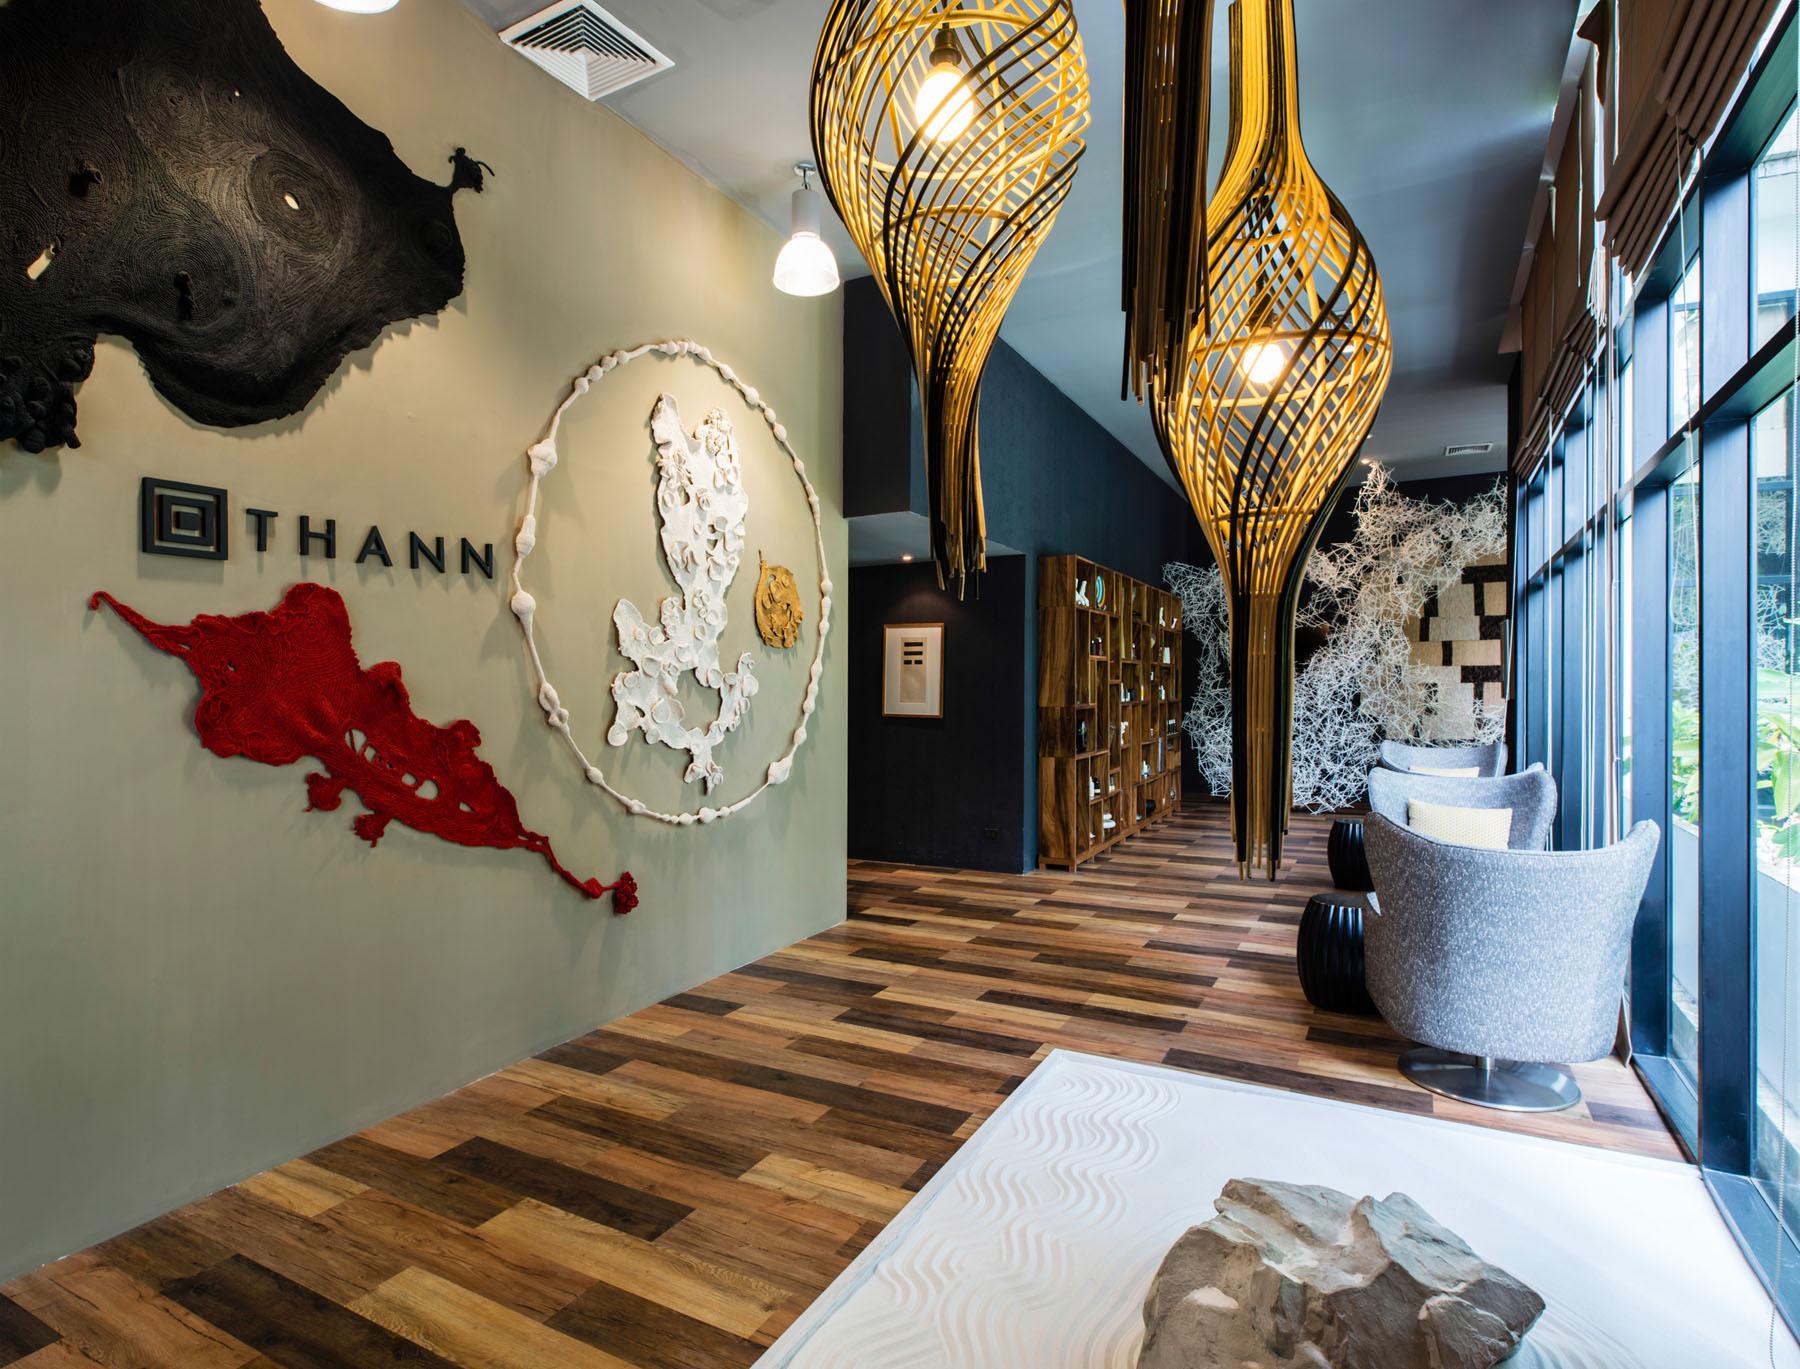 Thann Sanctuary 提供了泰式香氛療程、Thann 奢華招牌療程、Nano Shiso療程等三種尊寵服務。